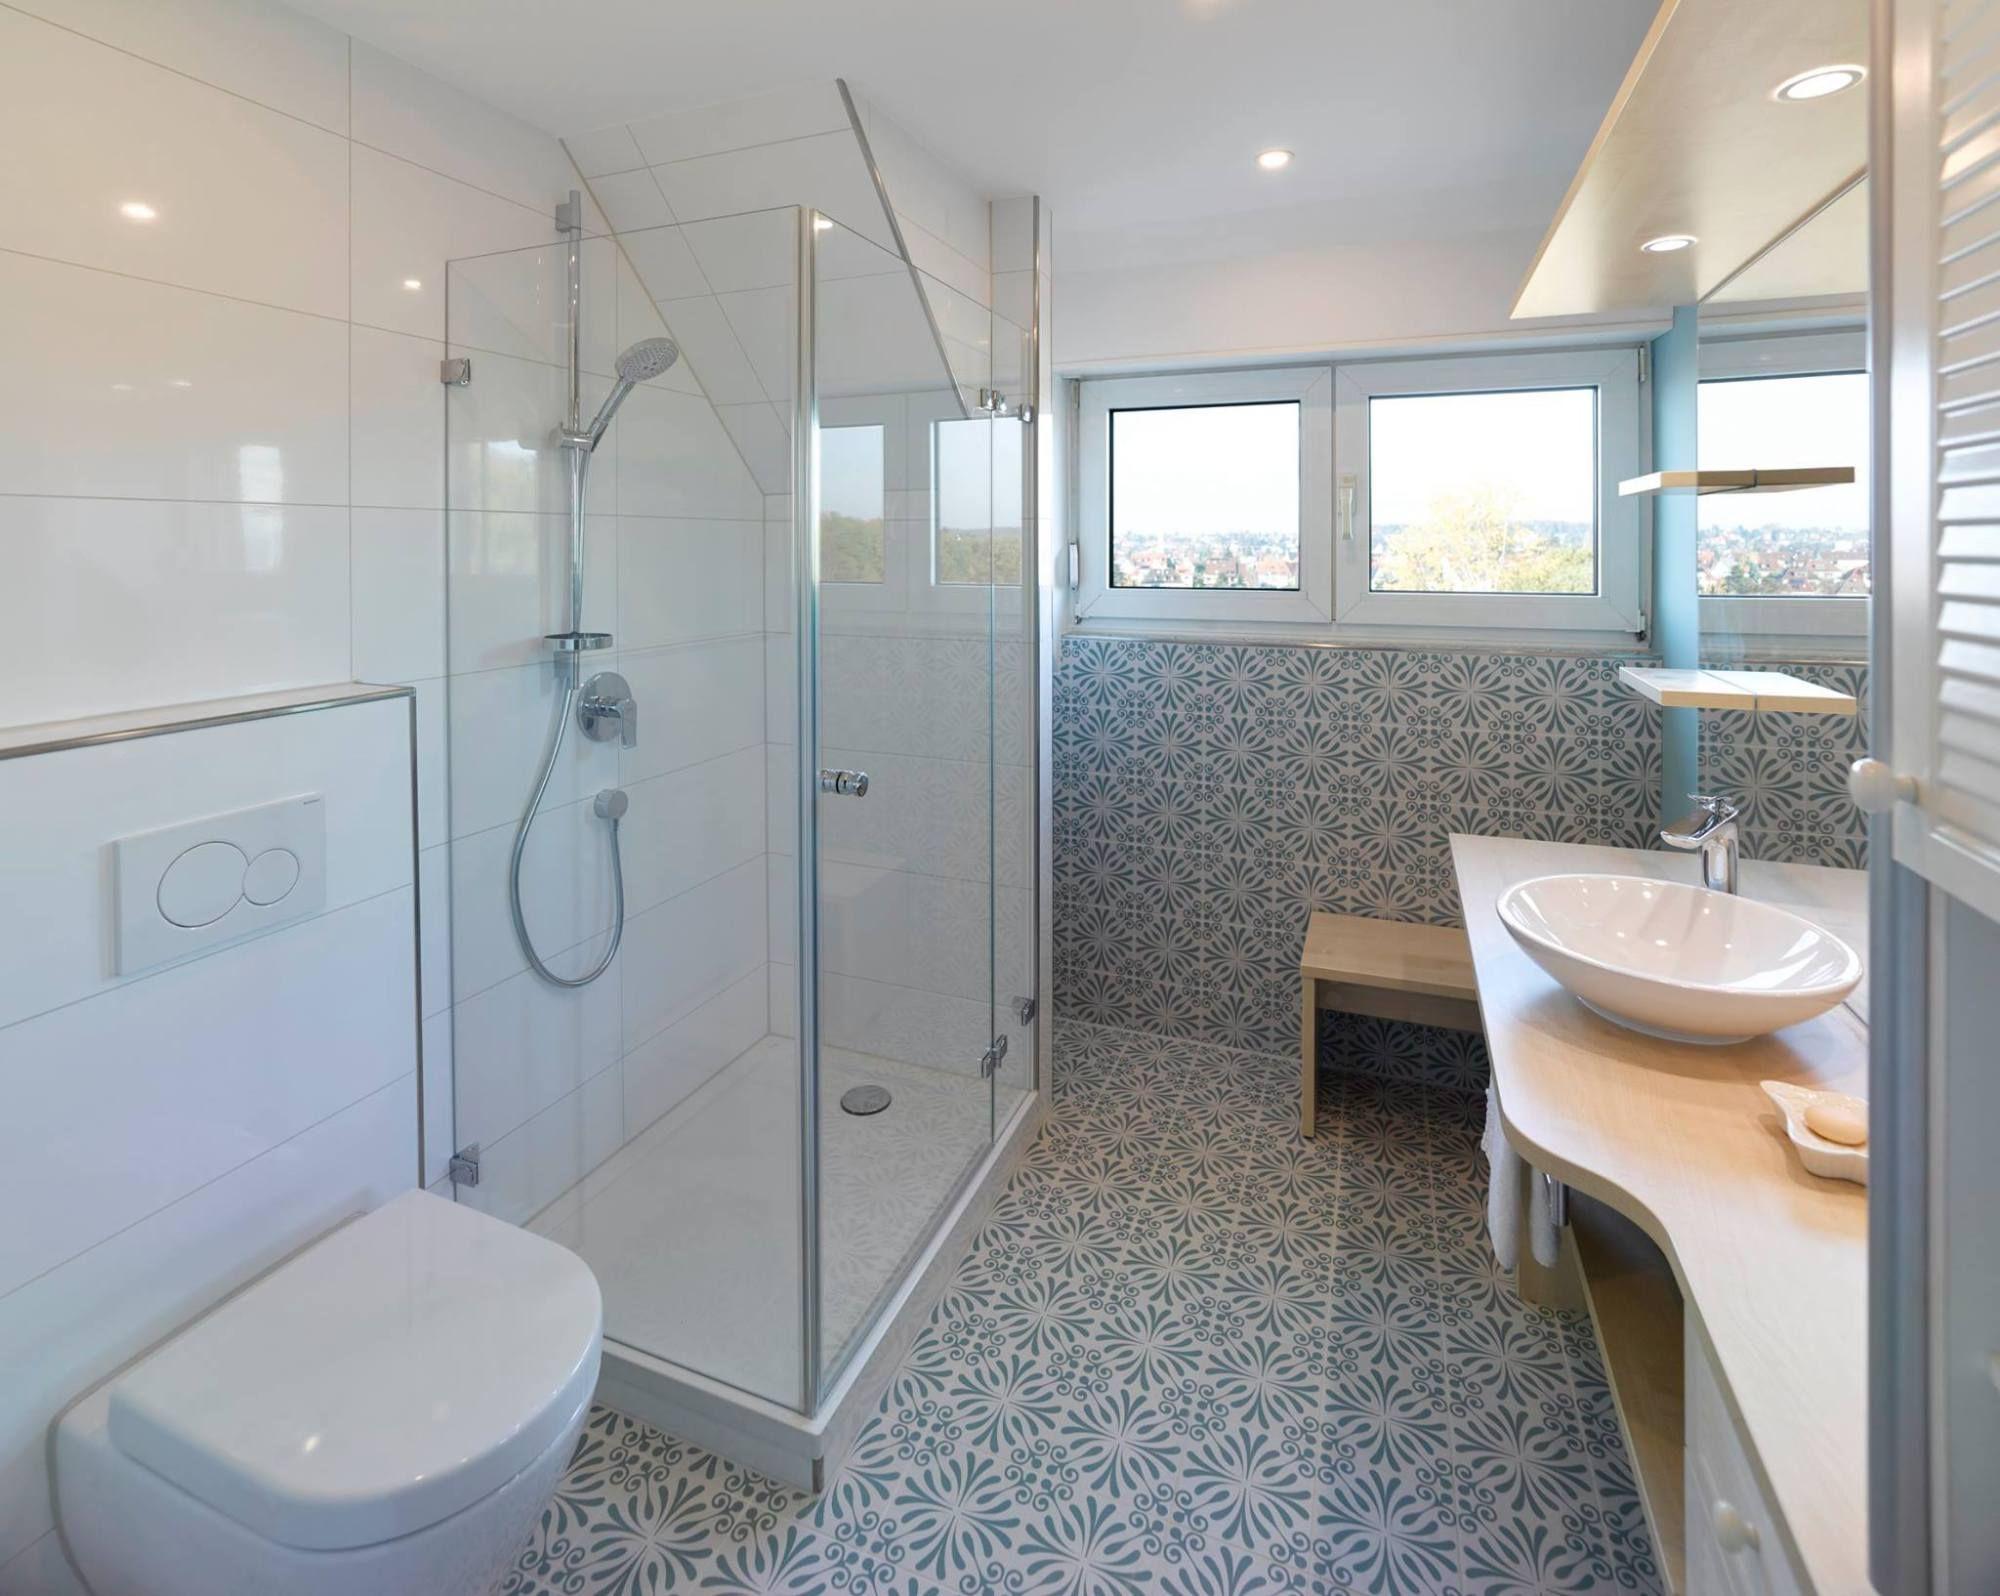 Fi Badezimmer ~ Villa ooghduyne julianadorp aan zee badezimmer mit miele